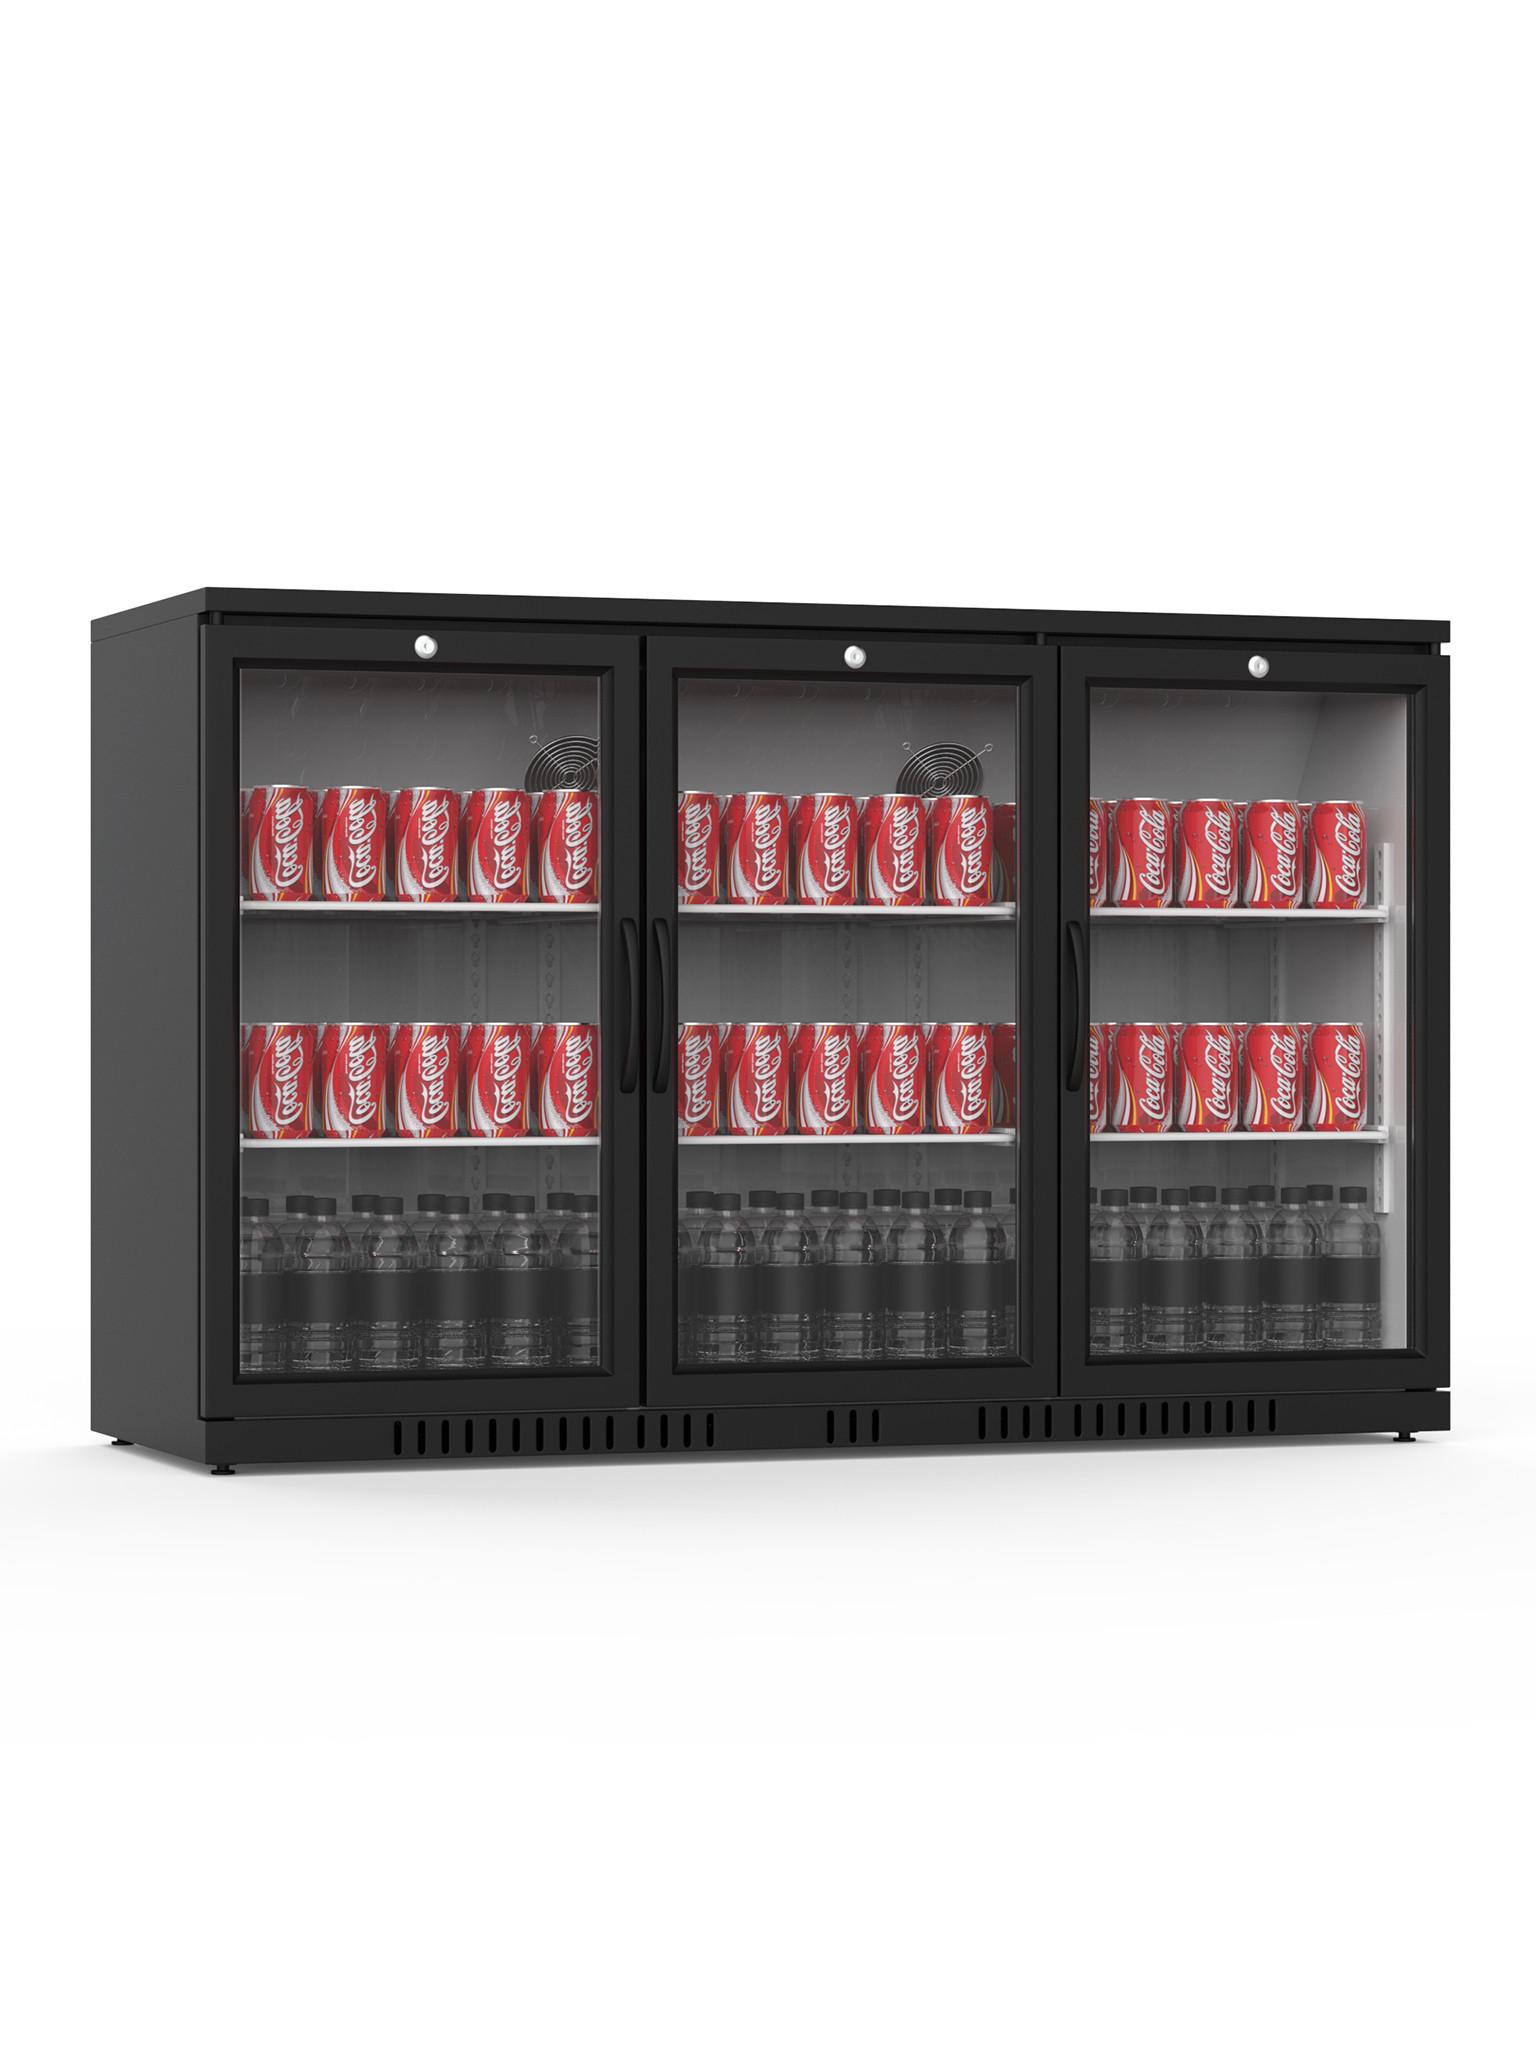 Promoline - 320 liter - 3 deurs - Zwart | Koelkast glazen deur